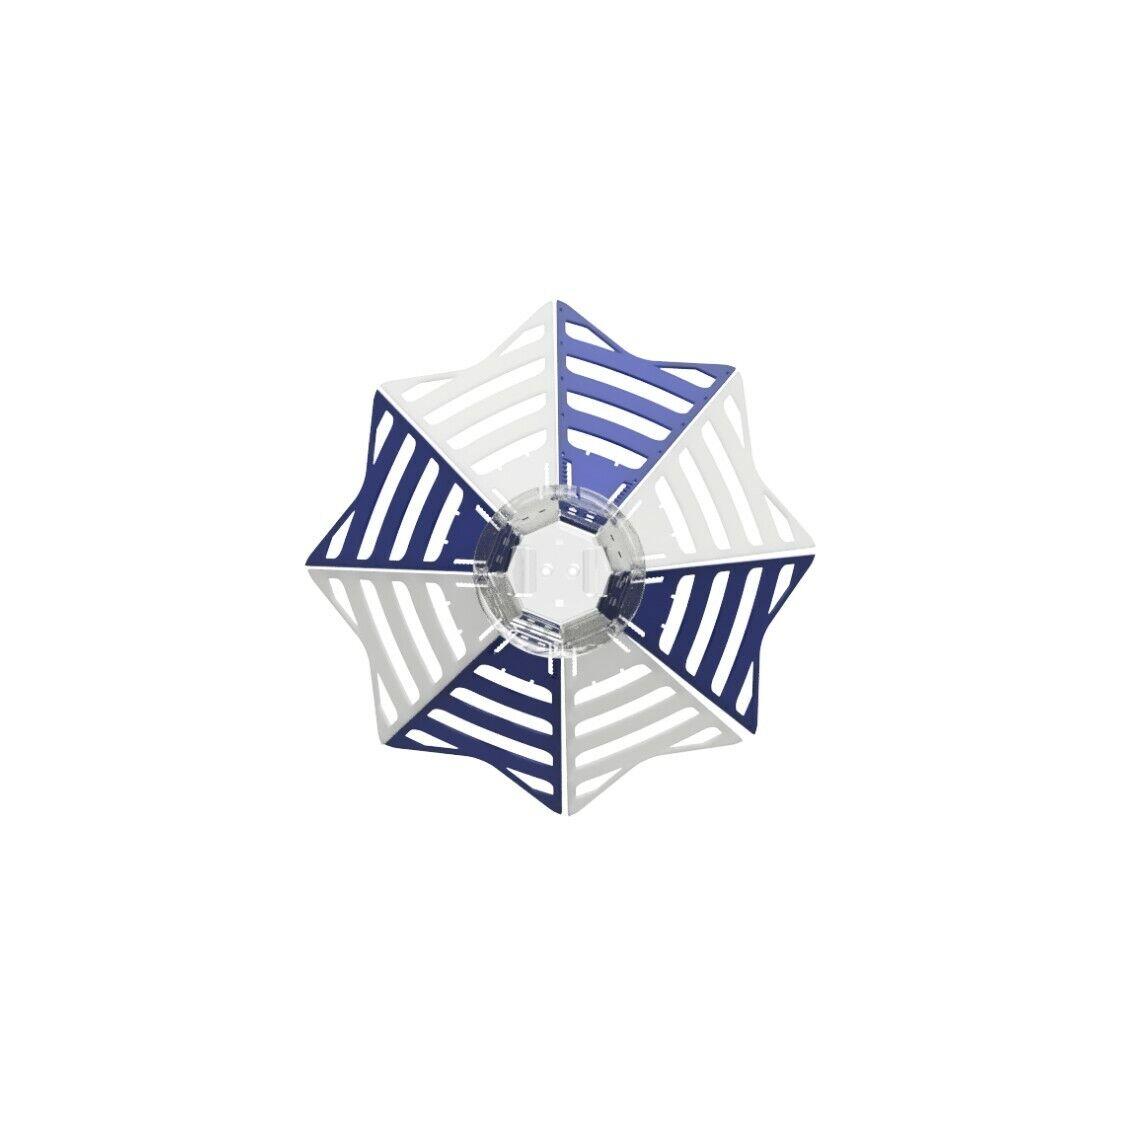 HCam blu & bianca, Paragliding Chasecam, follow aerodynamics cam, GoPro jHook